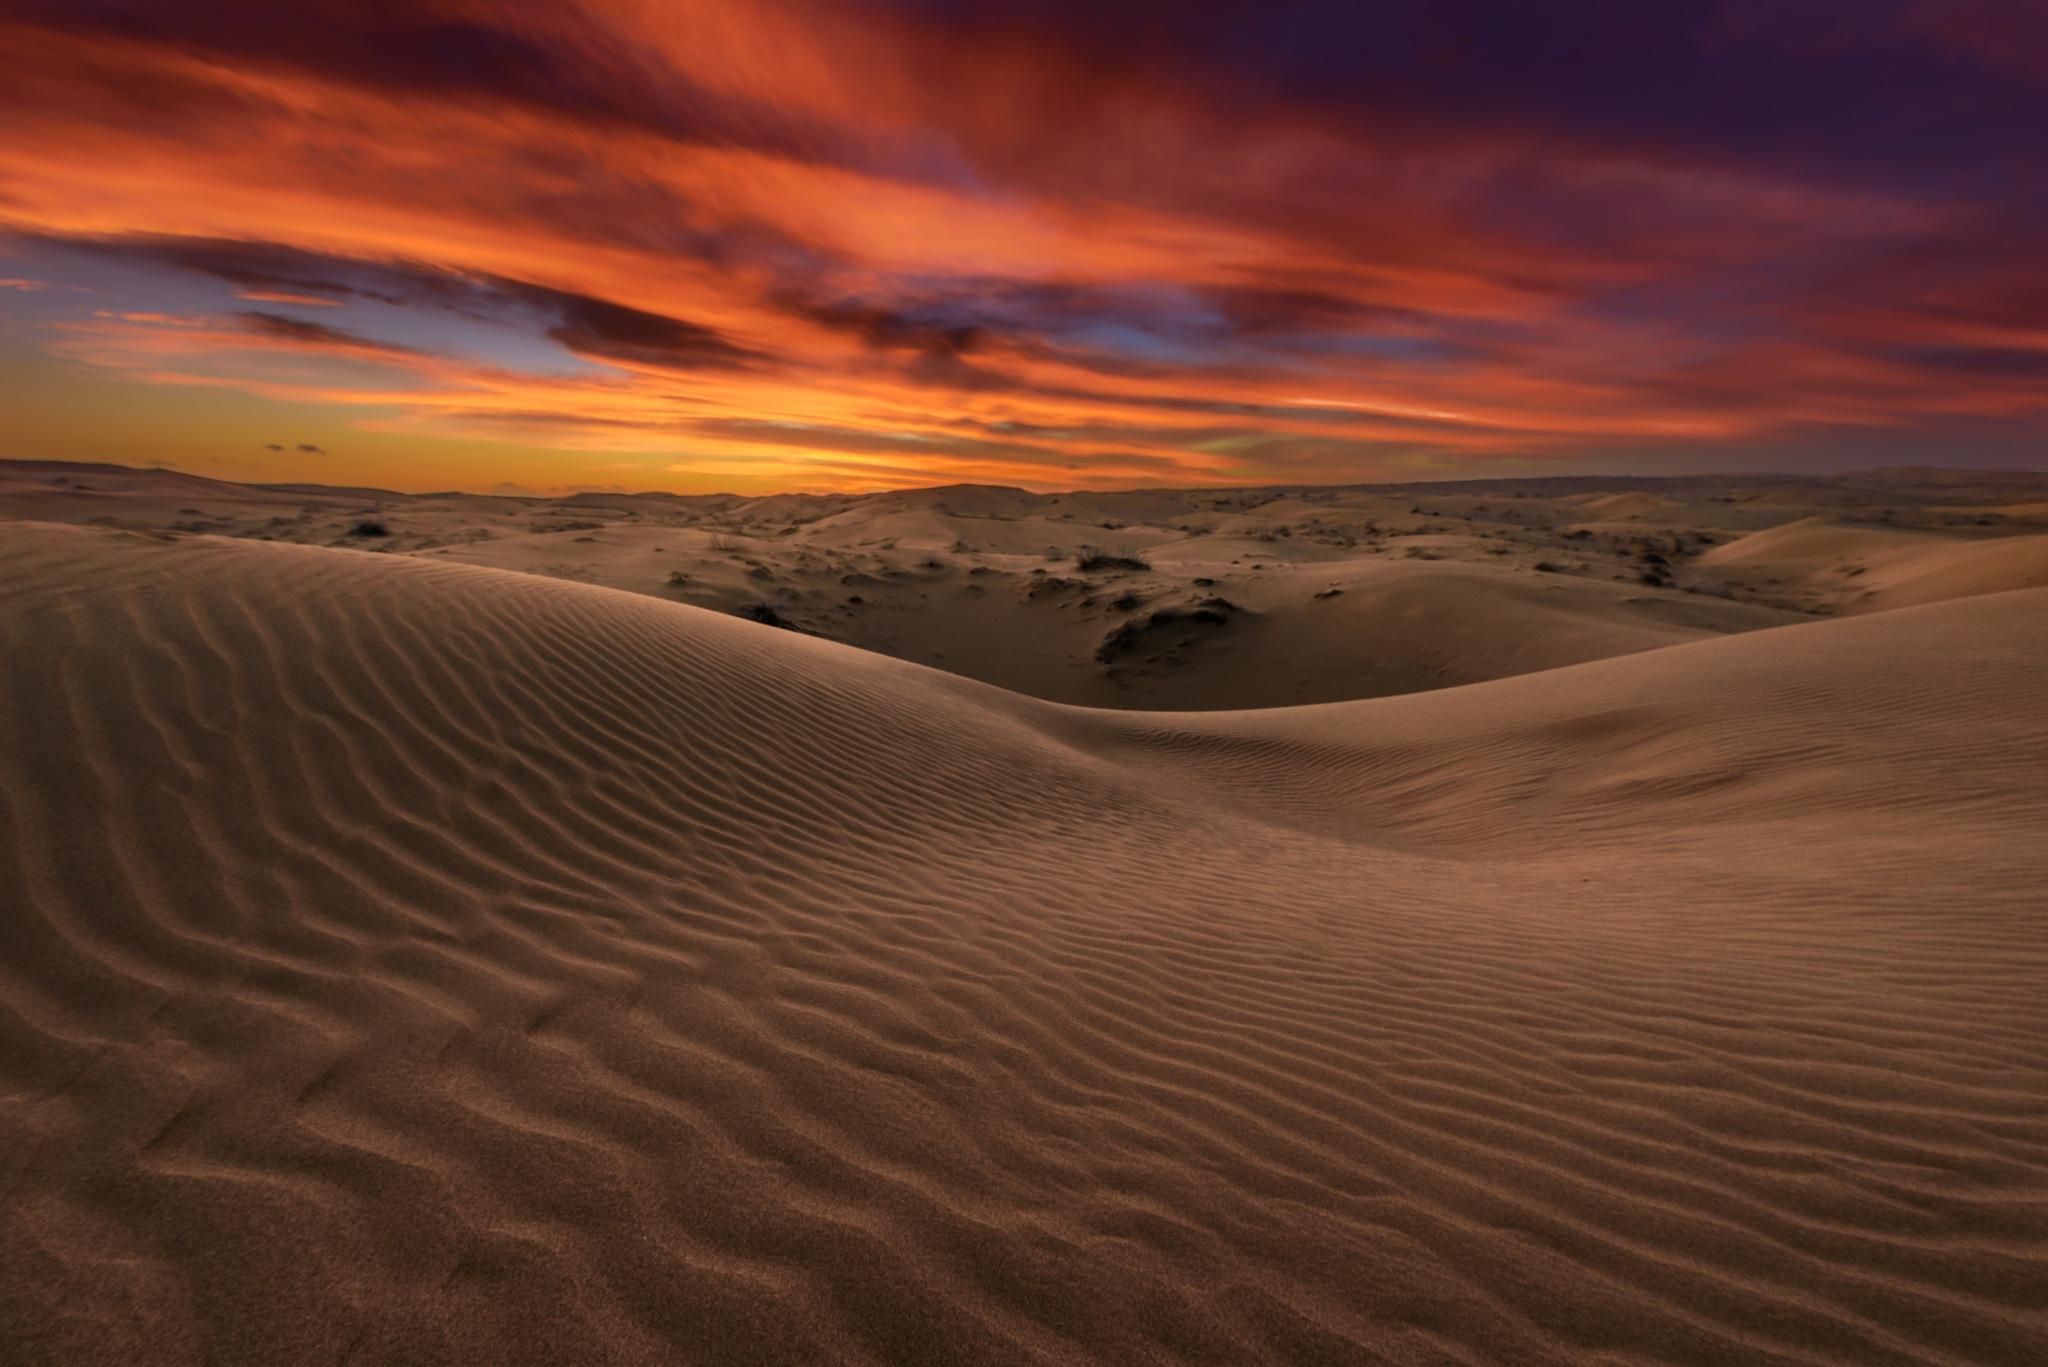 Desert texture by Saeed Mohammadzadeh